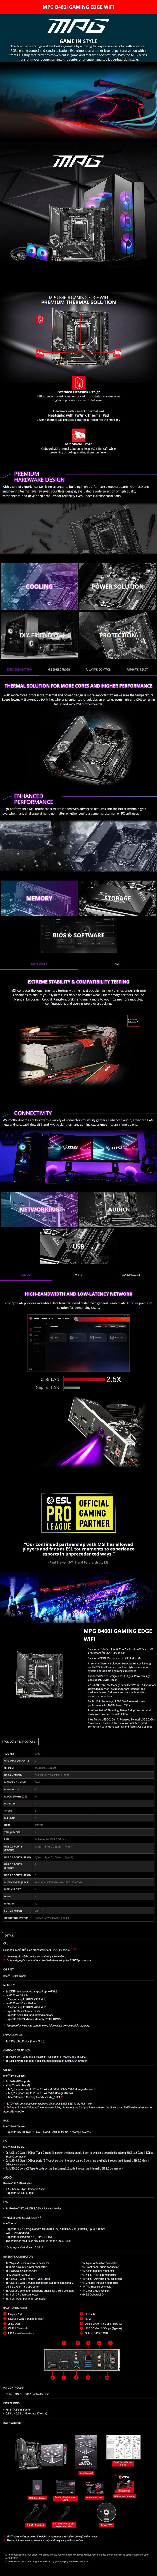 MSI MPG B460I Gaming Edge WiFi Mini-ITX Motherboard - Desktop Overview 1